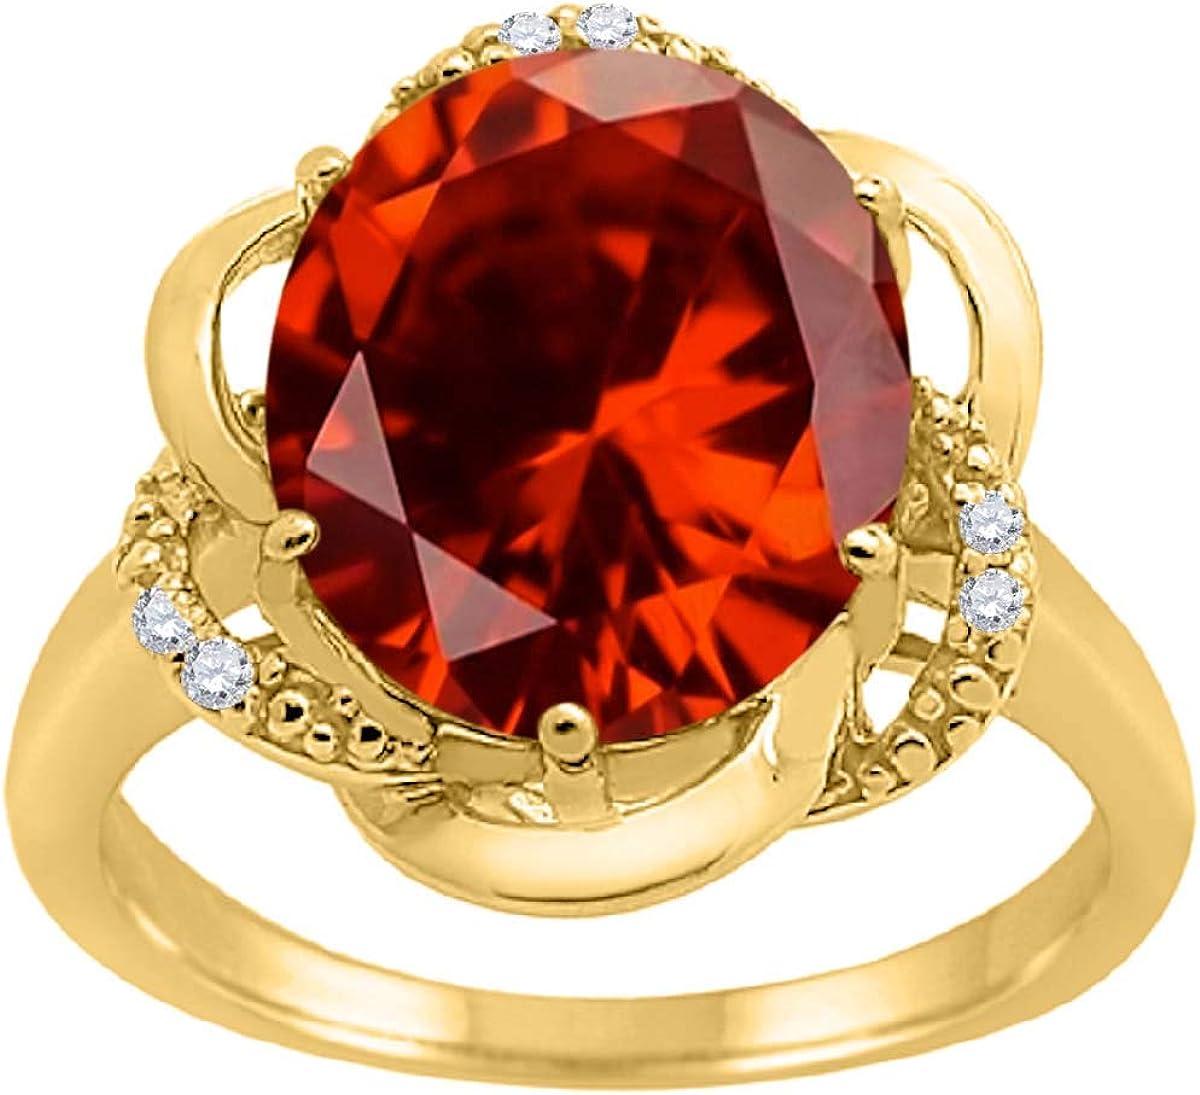 Details about  /Garnet 4.12 Ct Gemstone Cushion Shape 10k White Gold Ring for Women